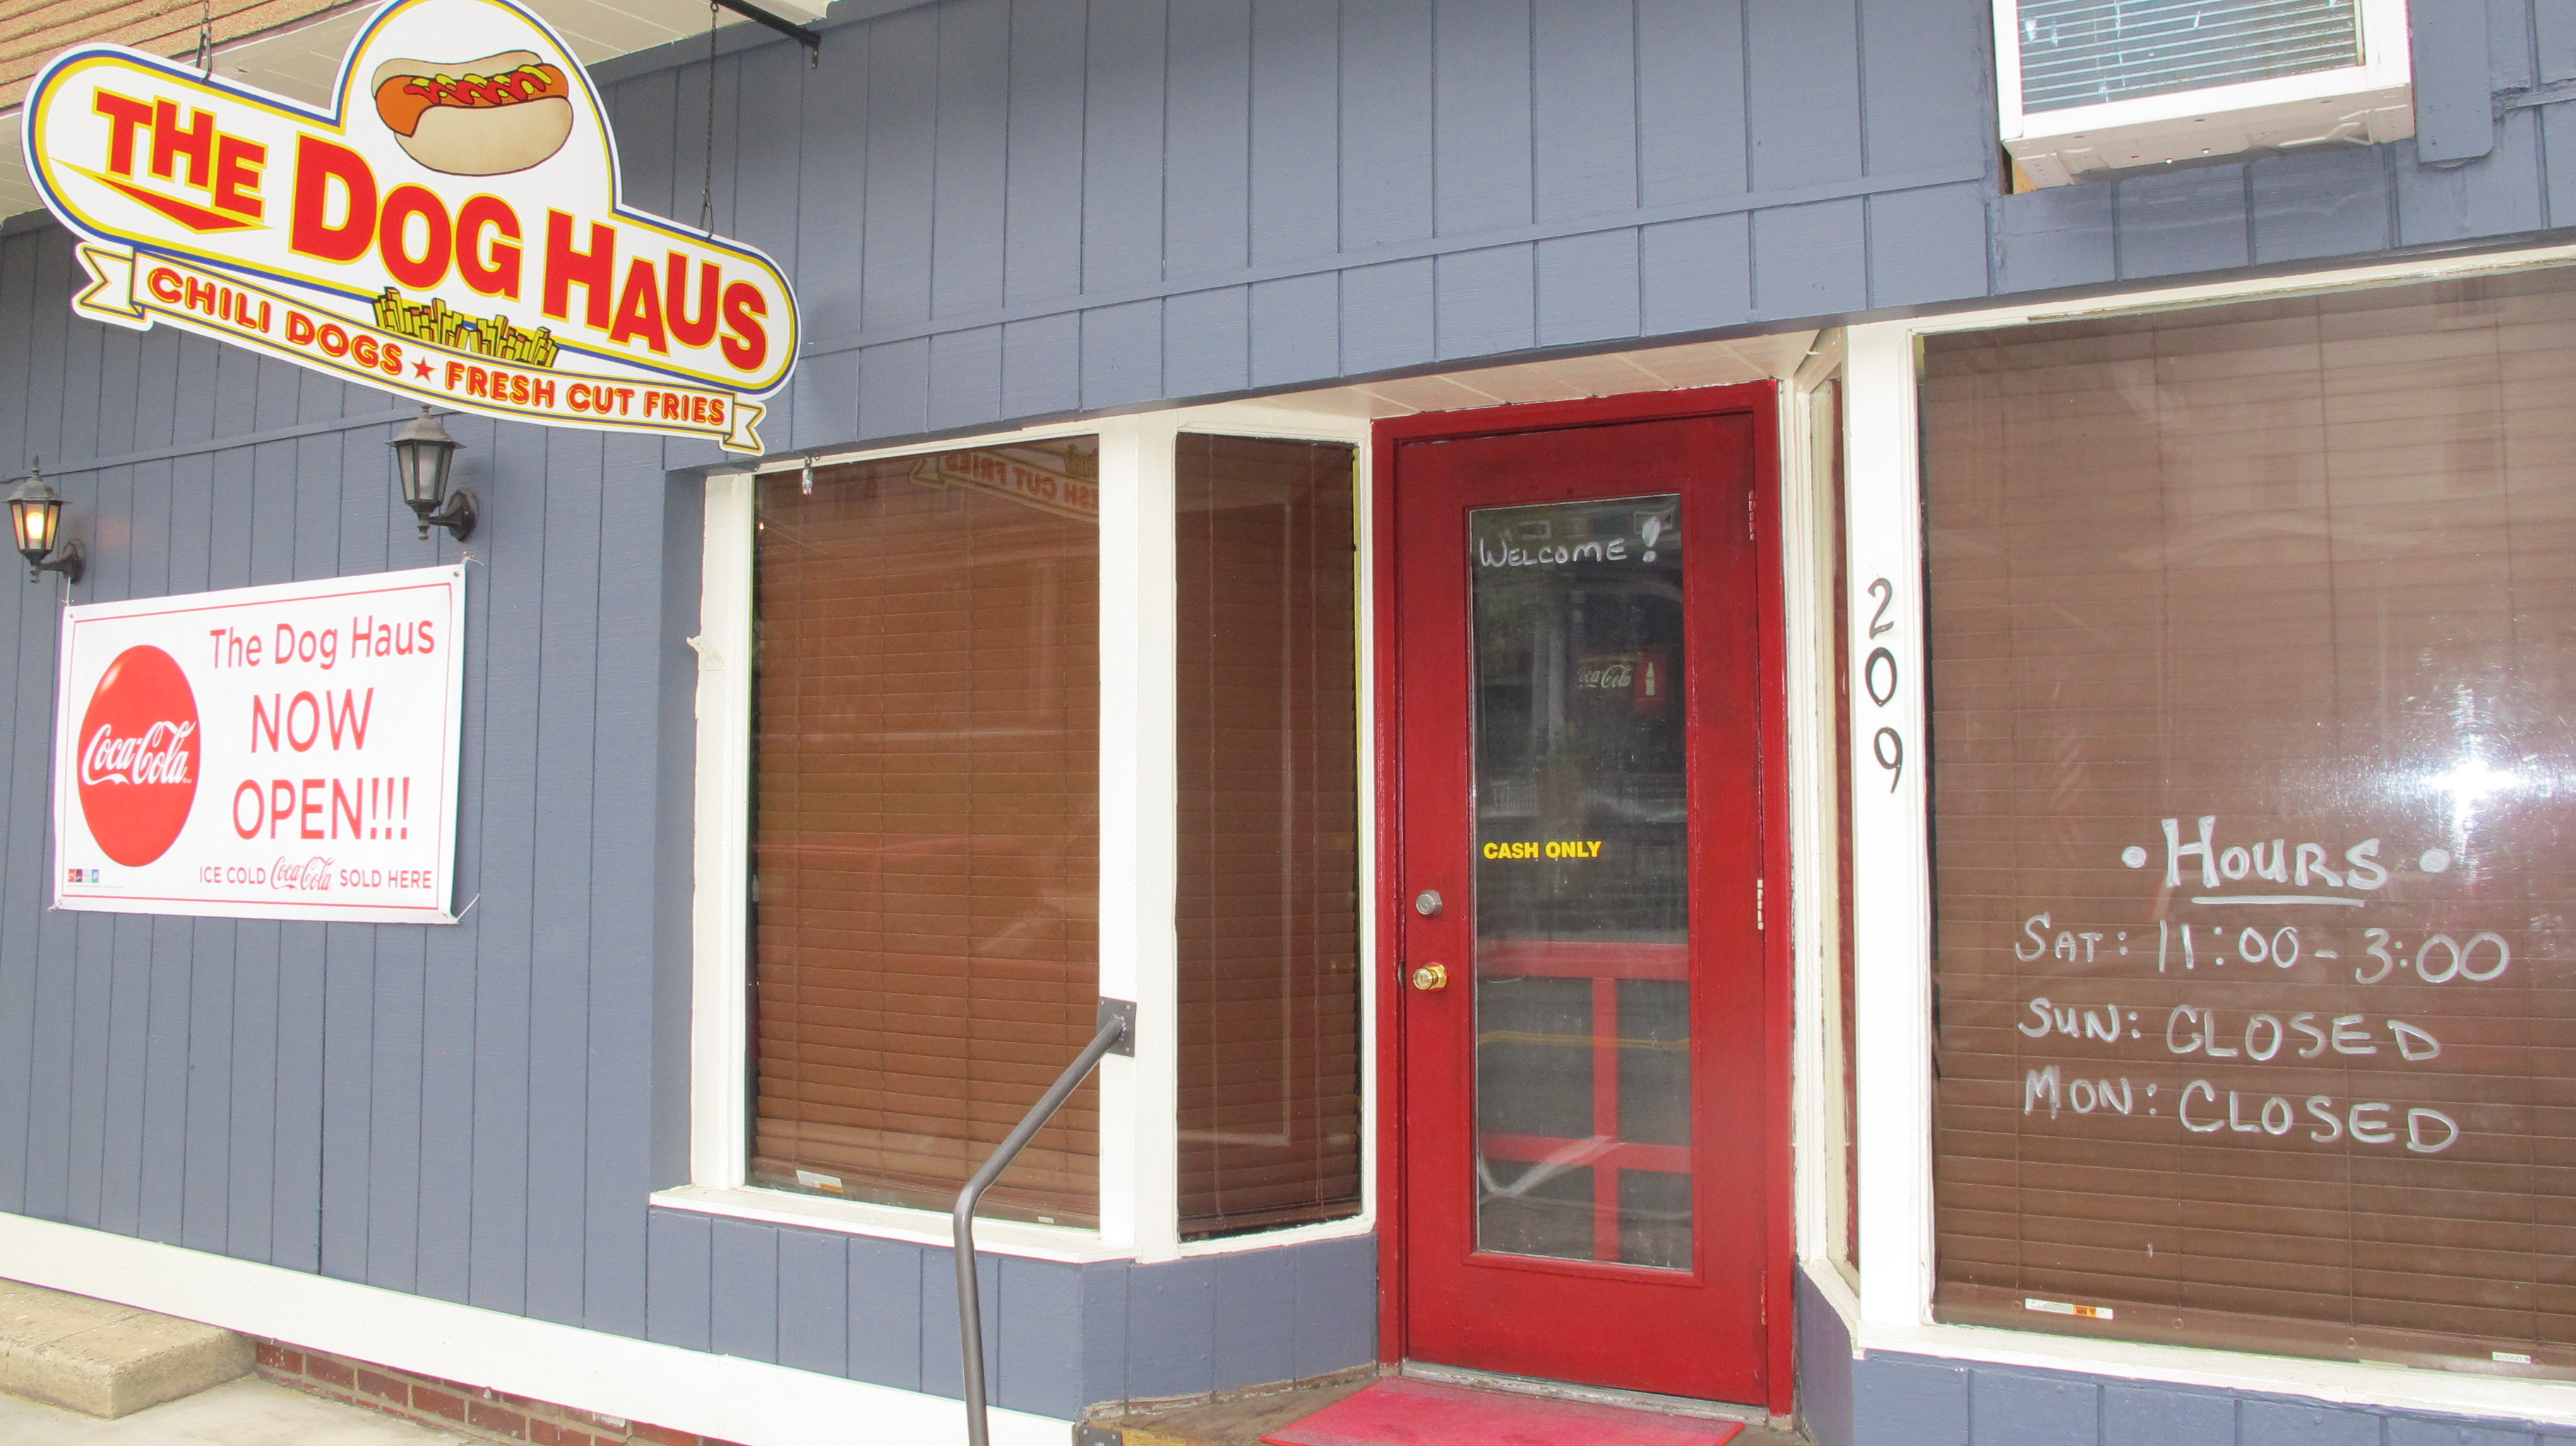 dog haus opens in tamaqua chili dogs burgers fresh cut. Black Bedroom Furniture Sets. Home Design Ideas